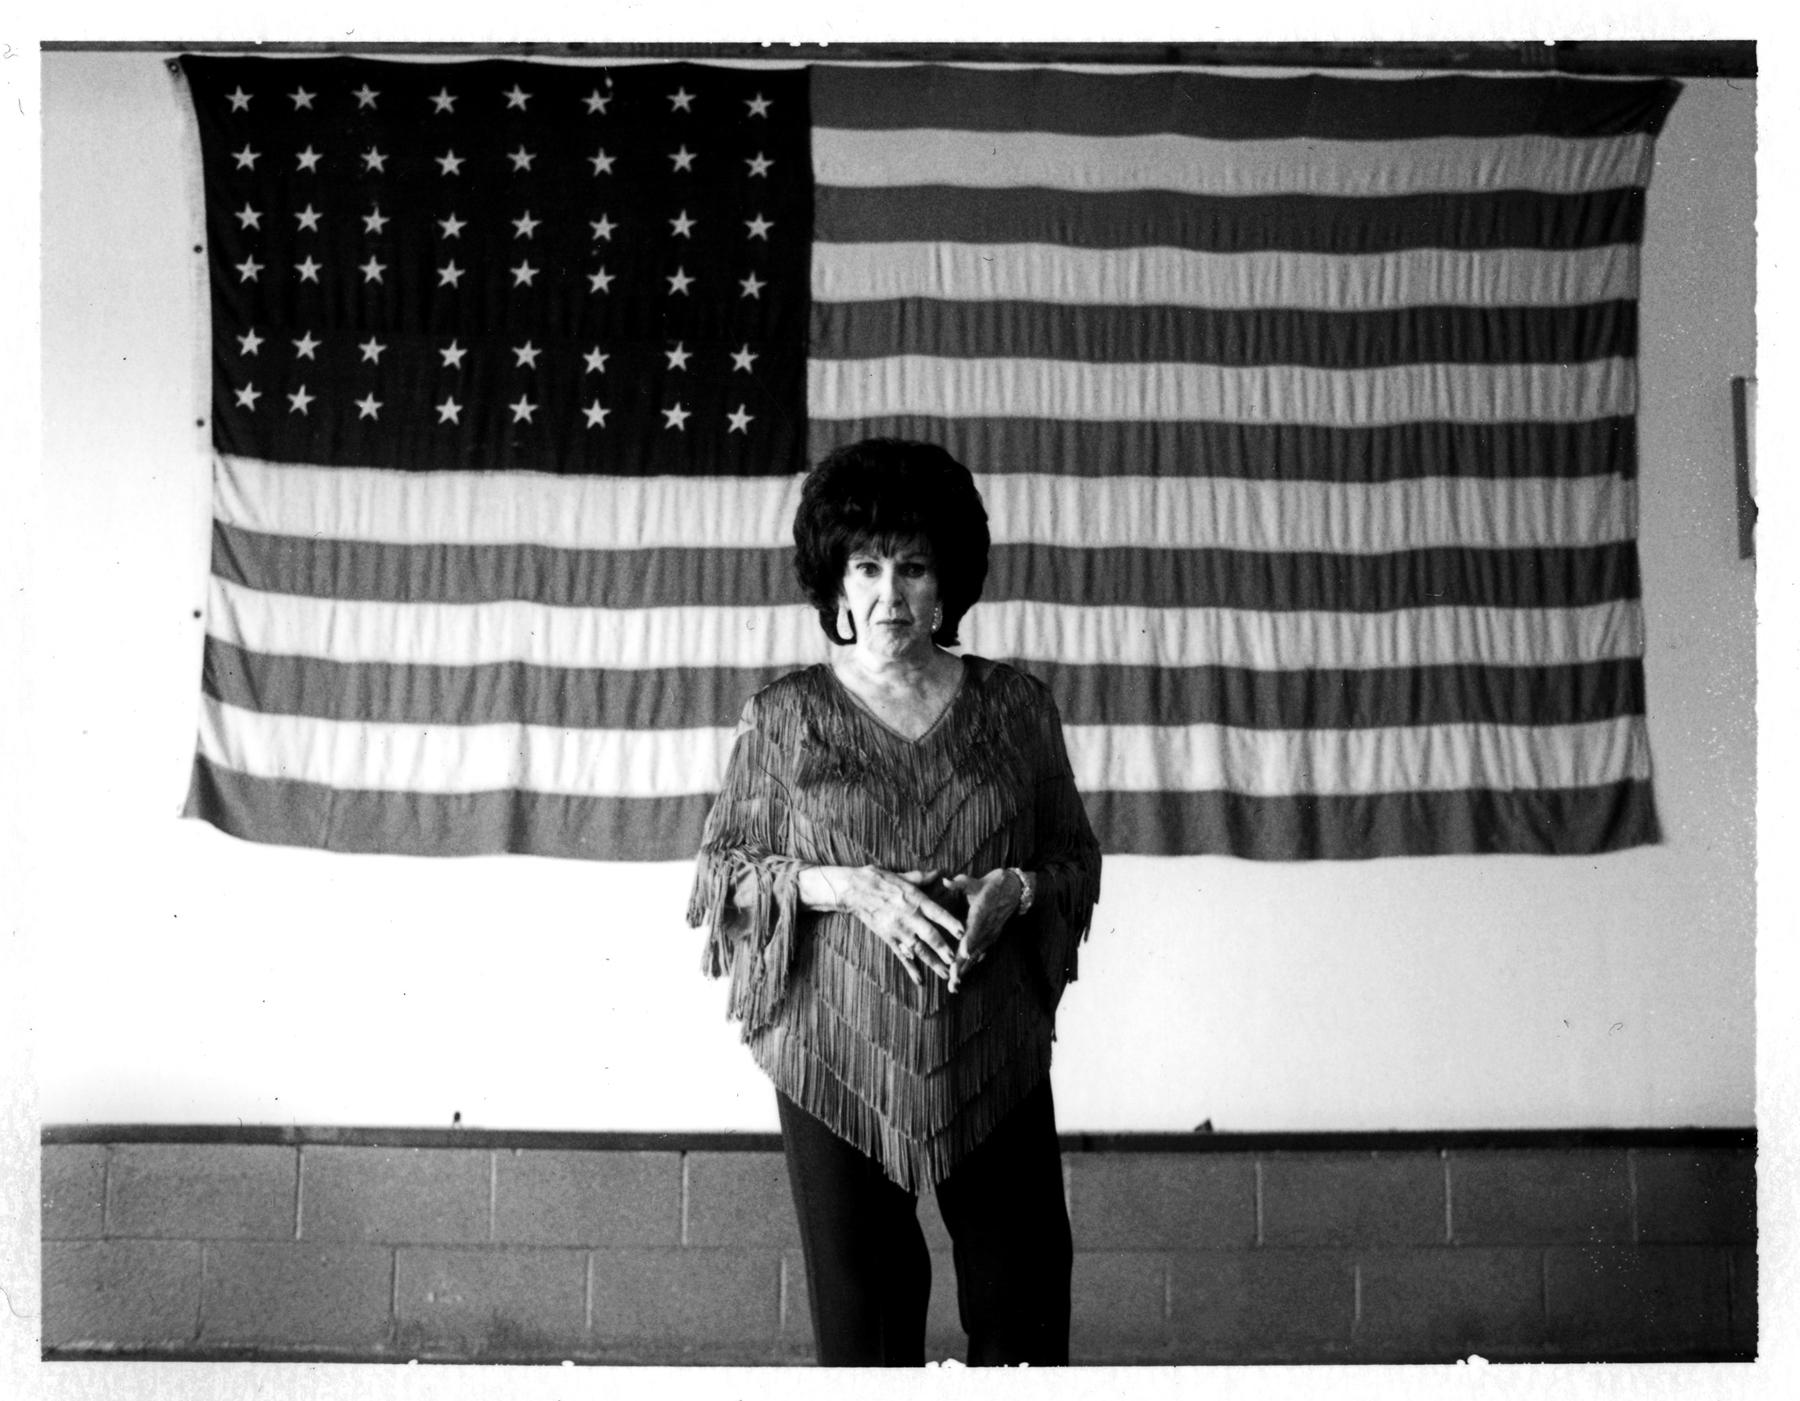 Wanda Jackson Covers the White Stripes – Song Premiere